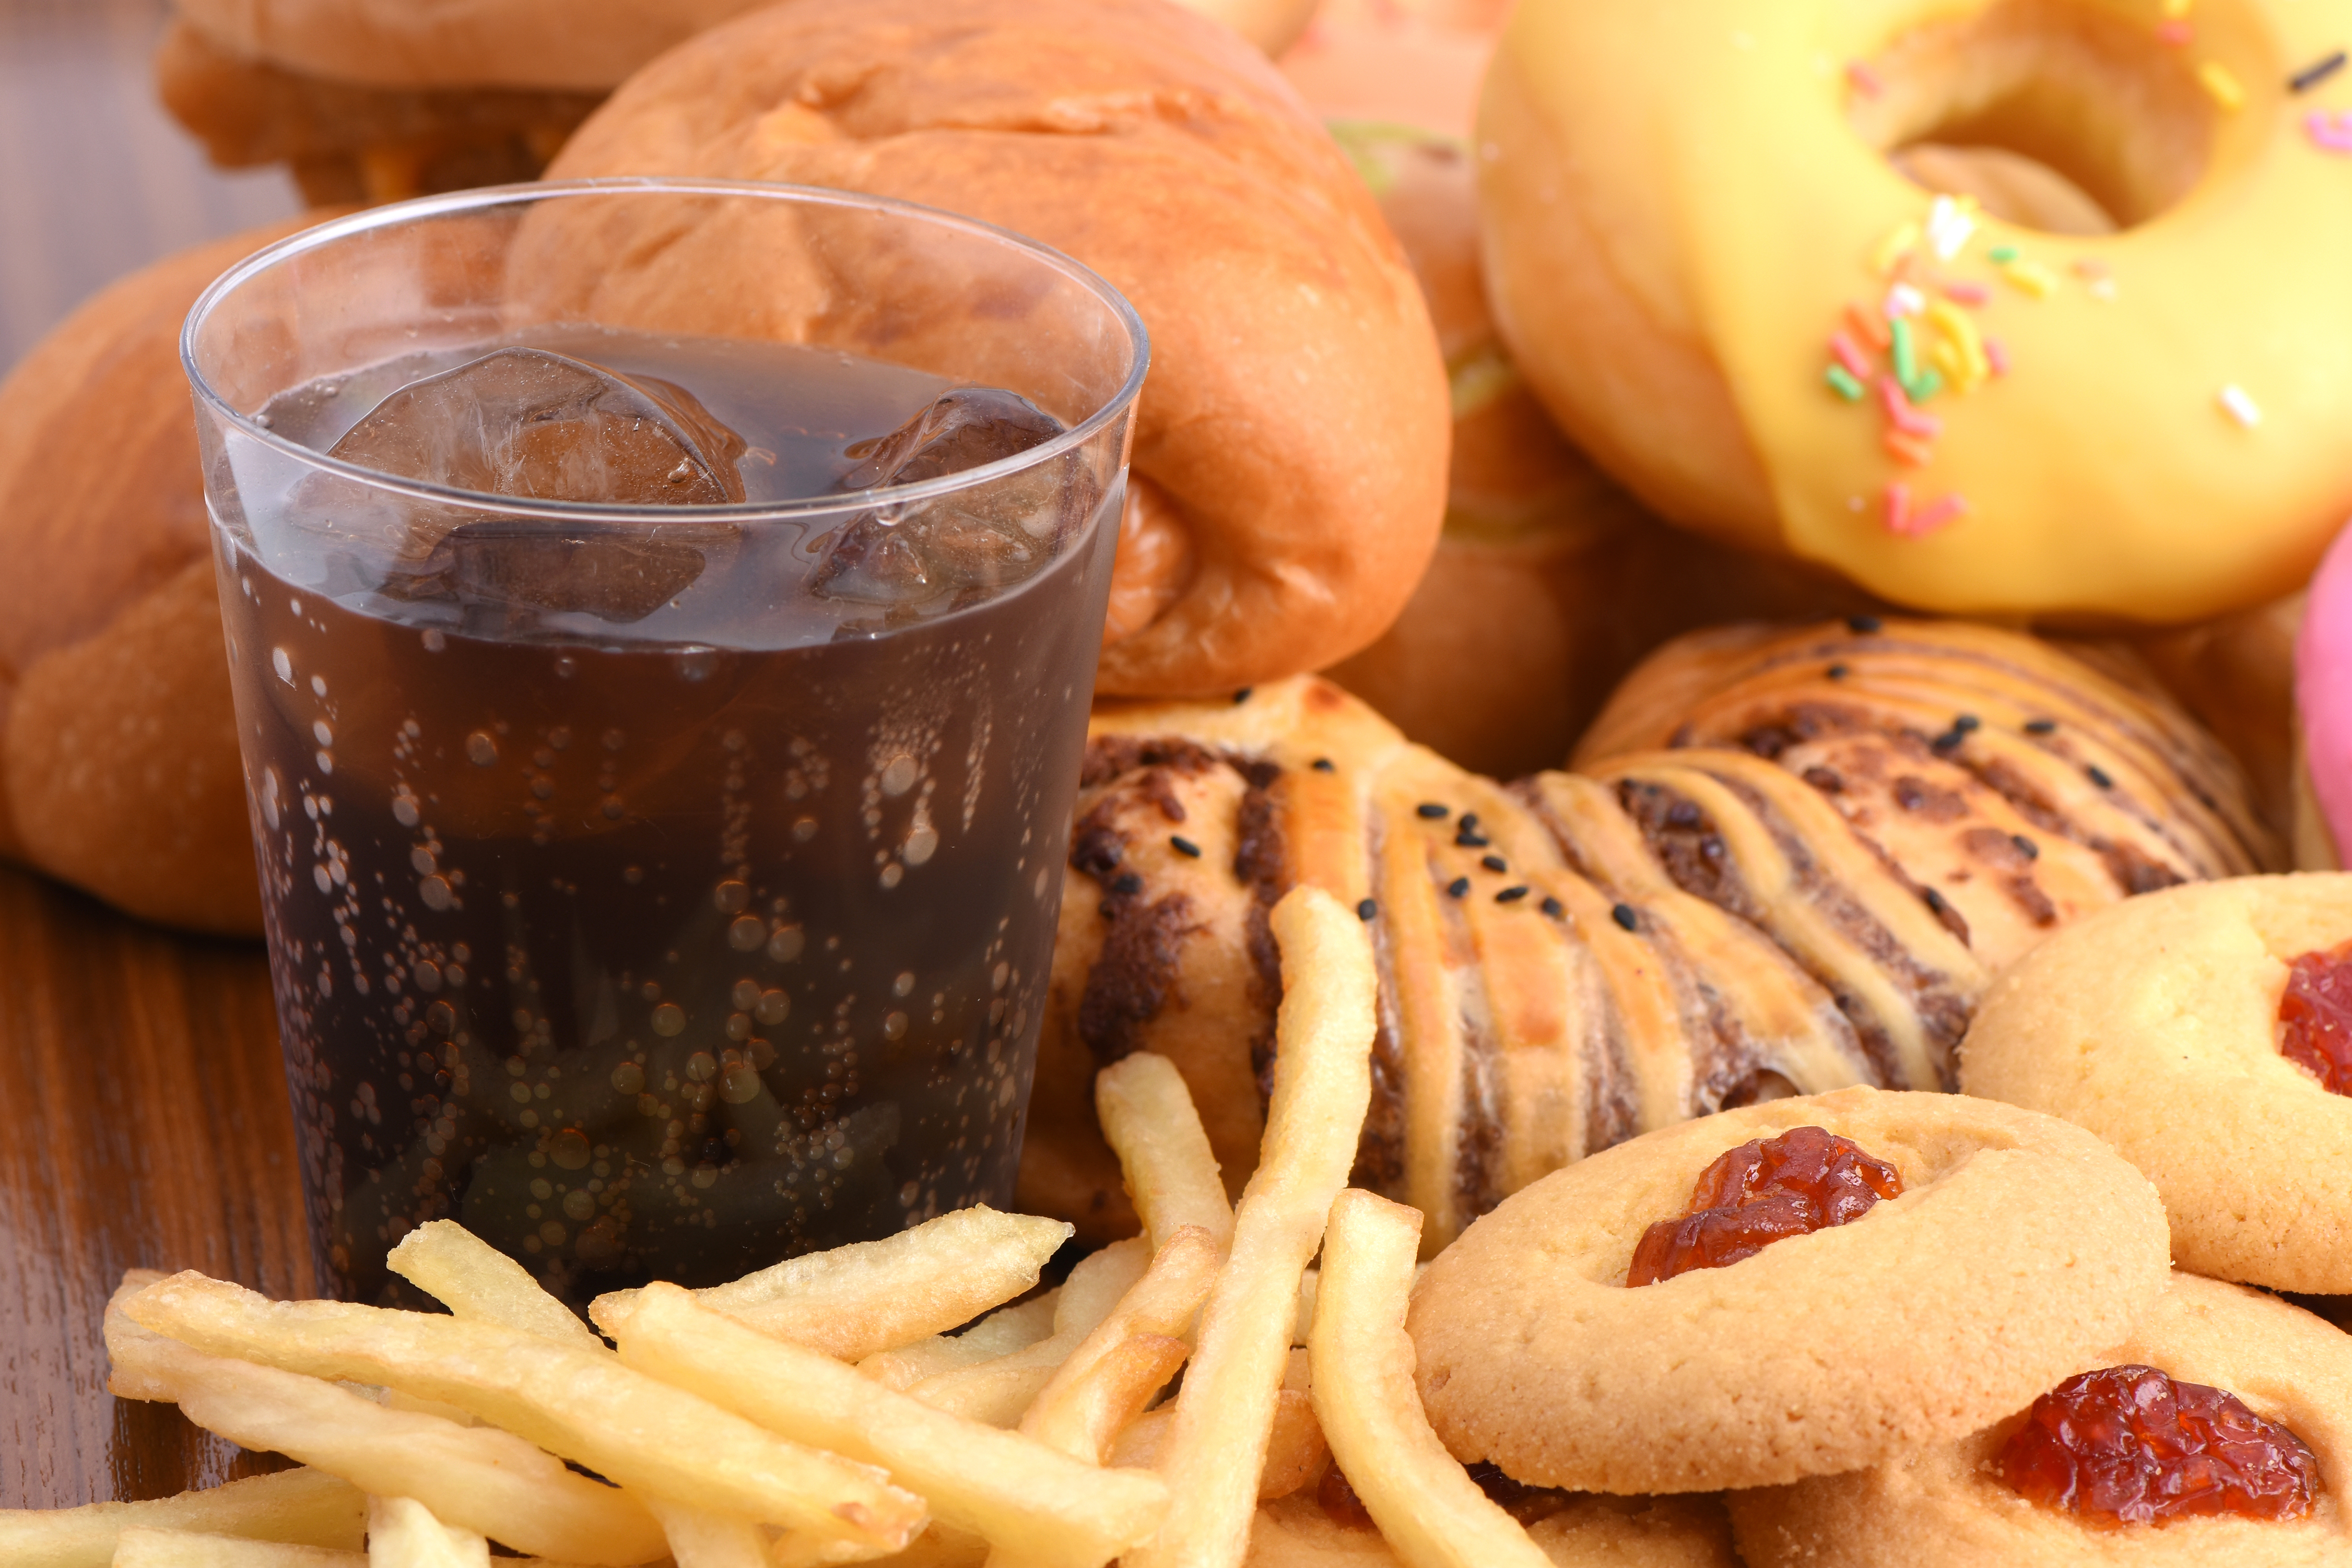 Poor Diet Tied to Half of U.S. Deaths From Heart Disease, Diabetes recommendations